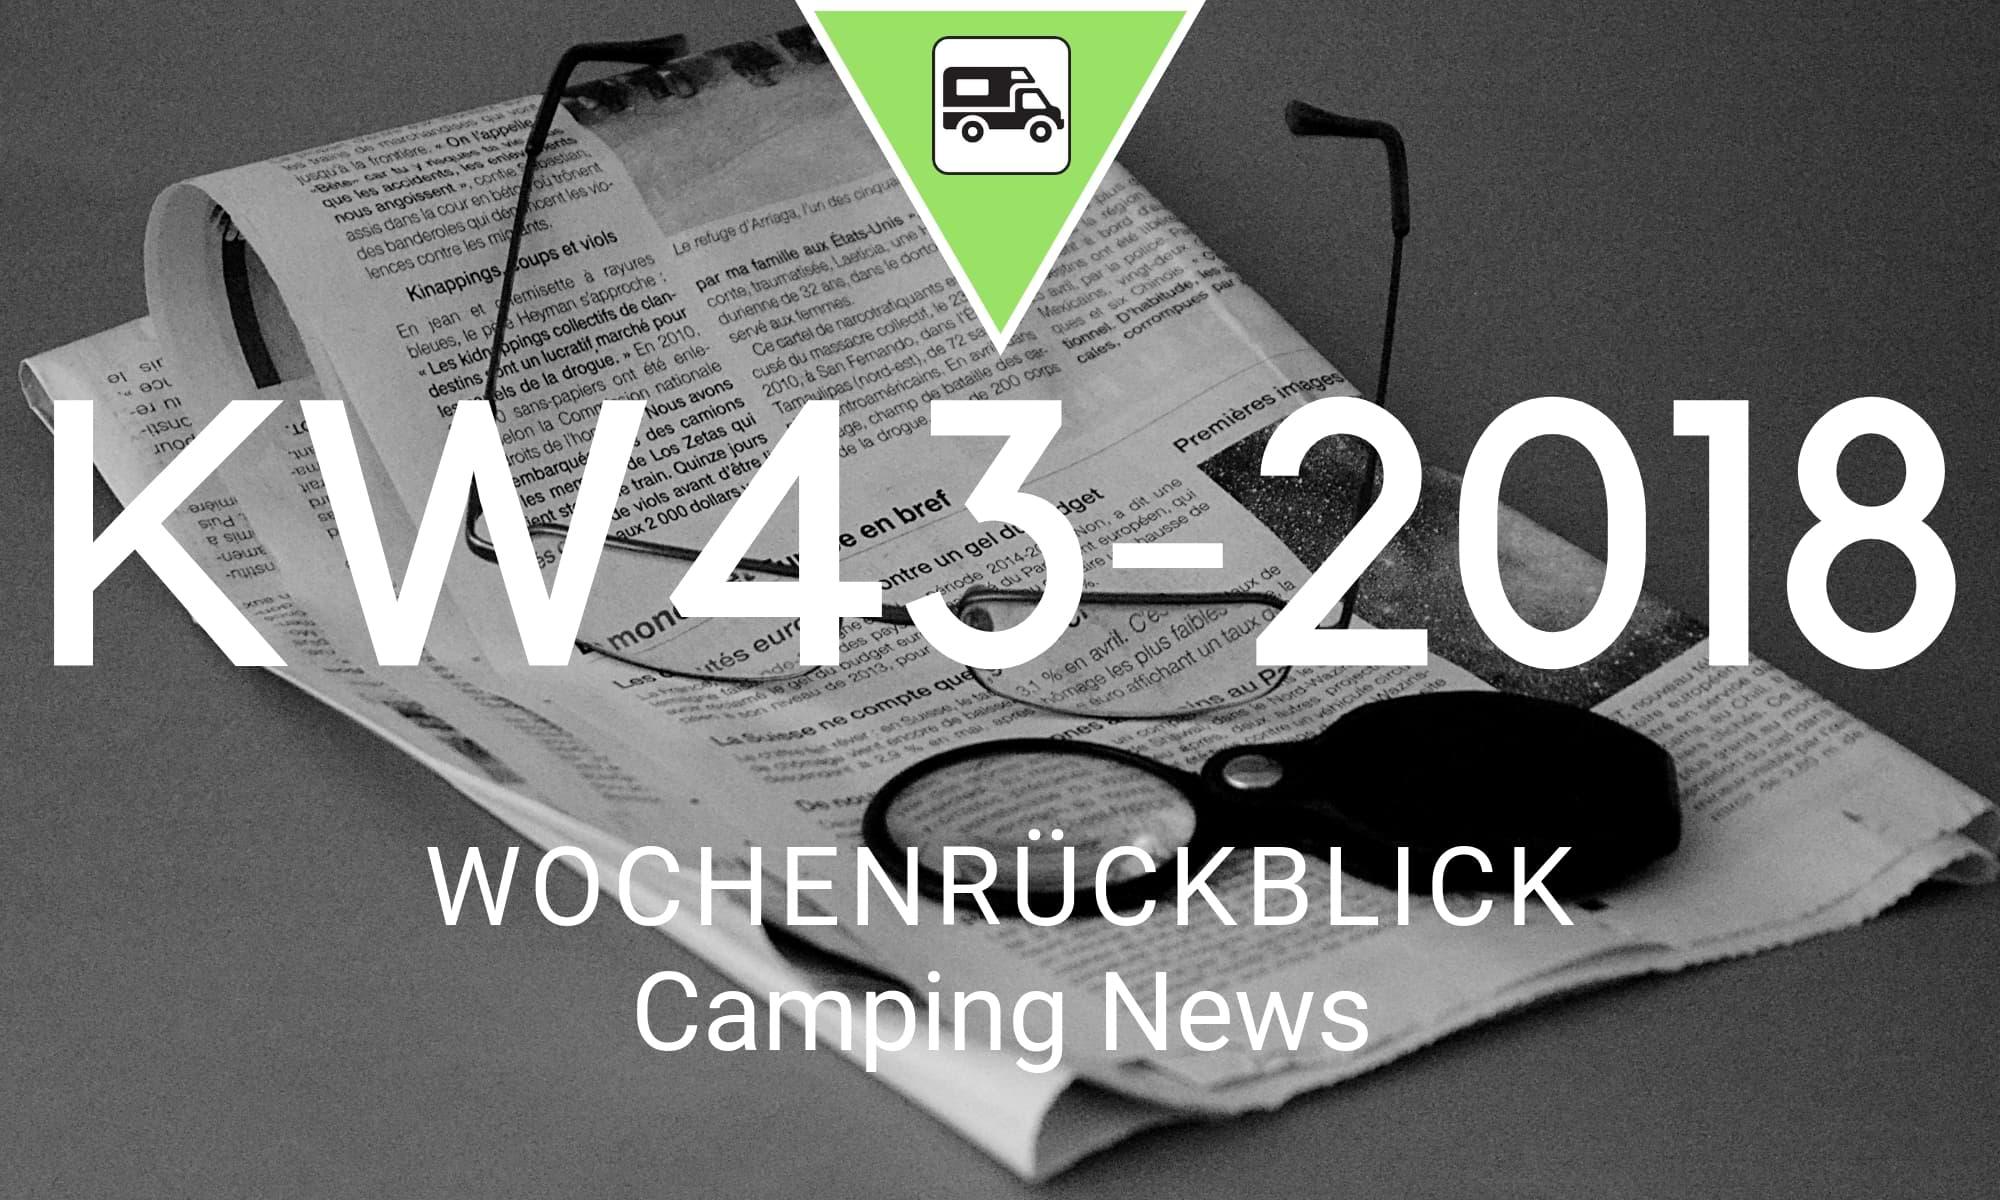 Wochenrückblick Camping News KW43-2018